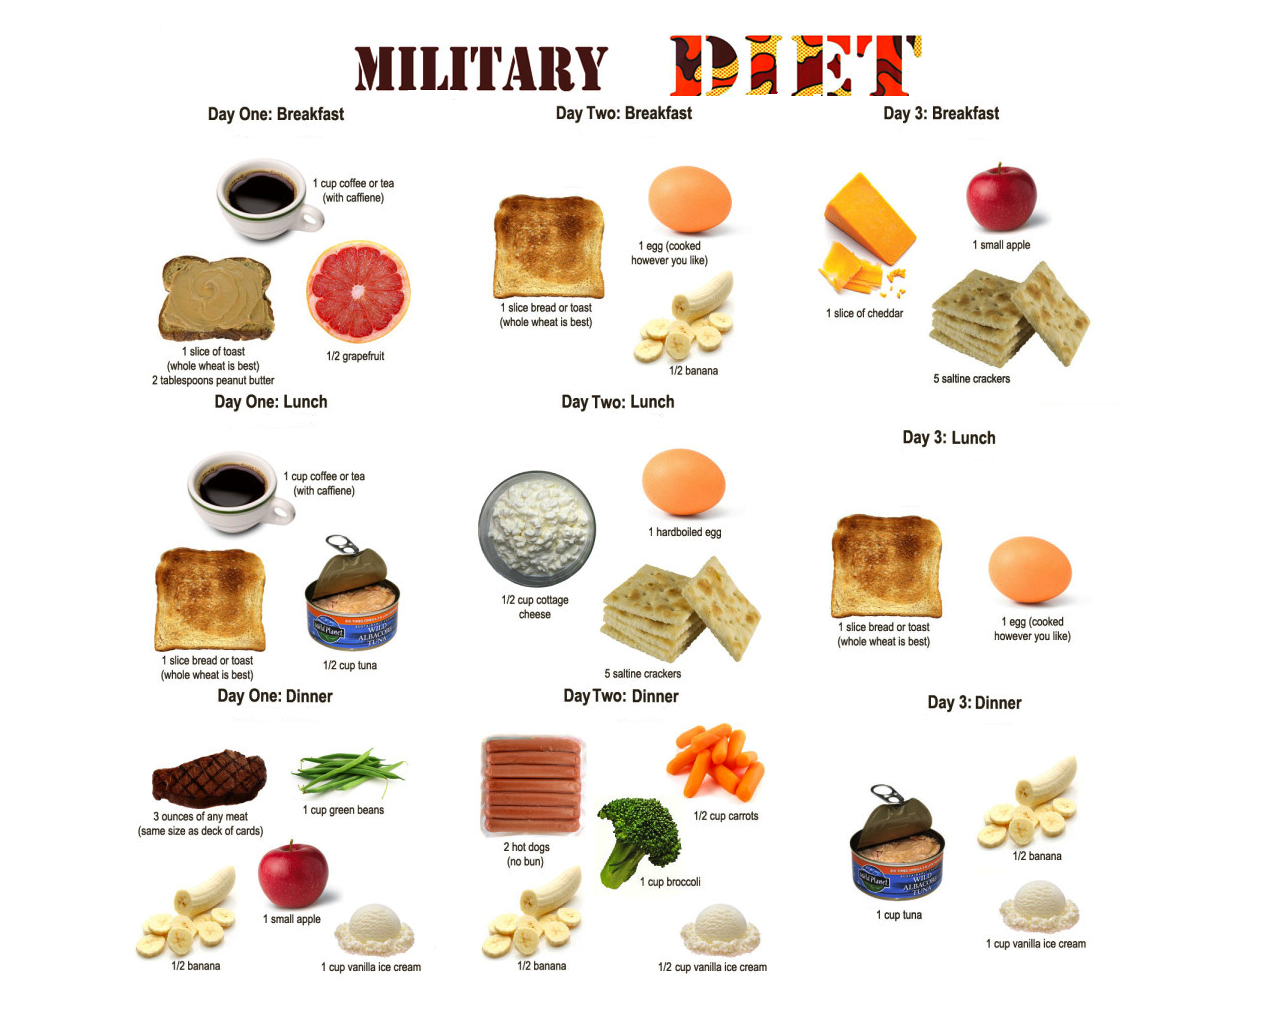 Military Diet Substitutions | DefendYourHealthcare.us